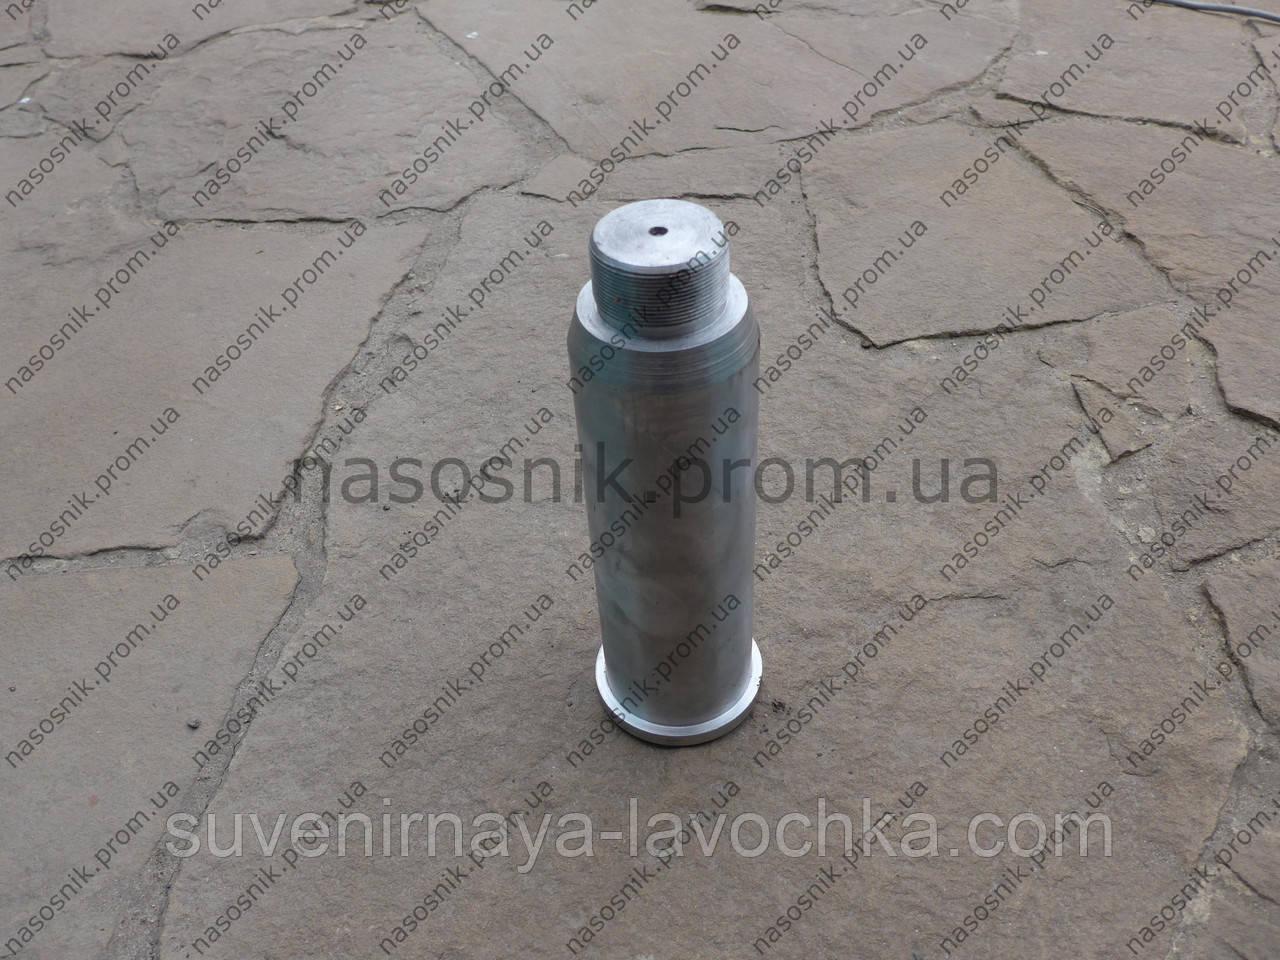 Палец на портал ф70, L245, М48х1,5 погрузчика ХТЗ Т-156 (ТО-25.80.00.002)